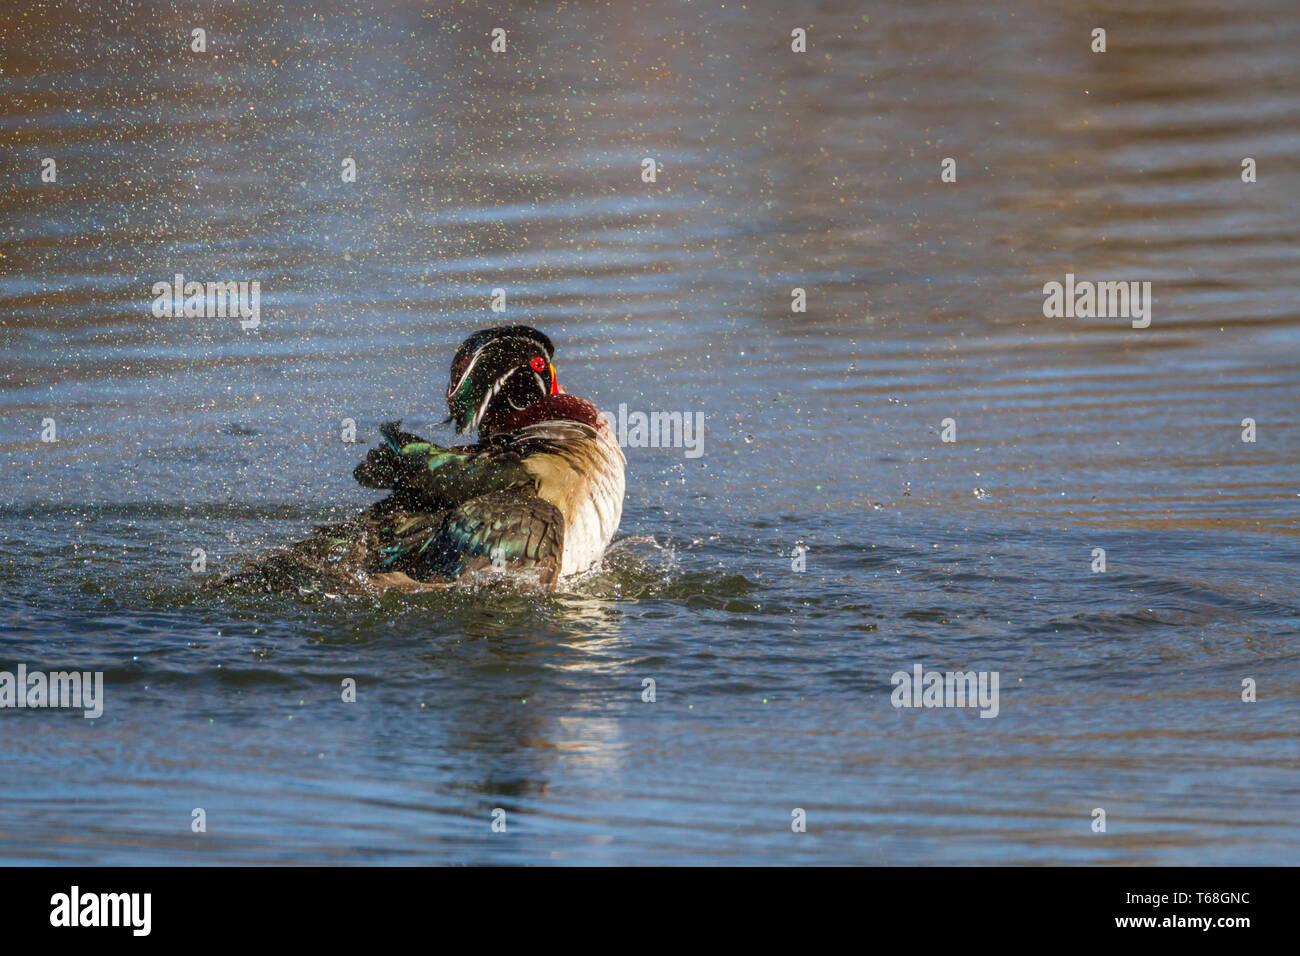 Colourful, beautiful wood duck drake splashing in water at Inglewood Bird Sanctuary, Calgary, Canada Stock Photo